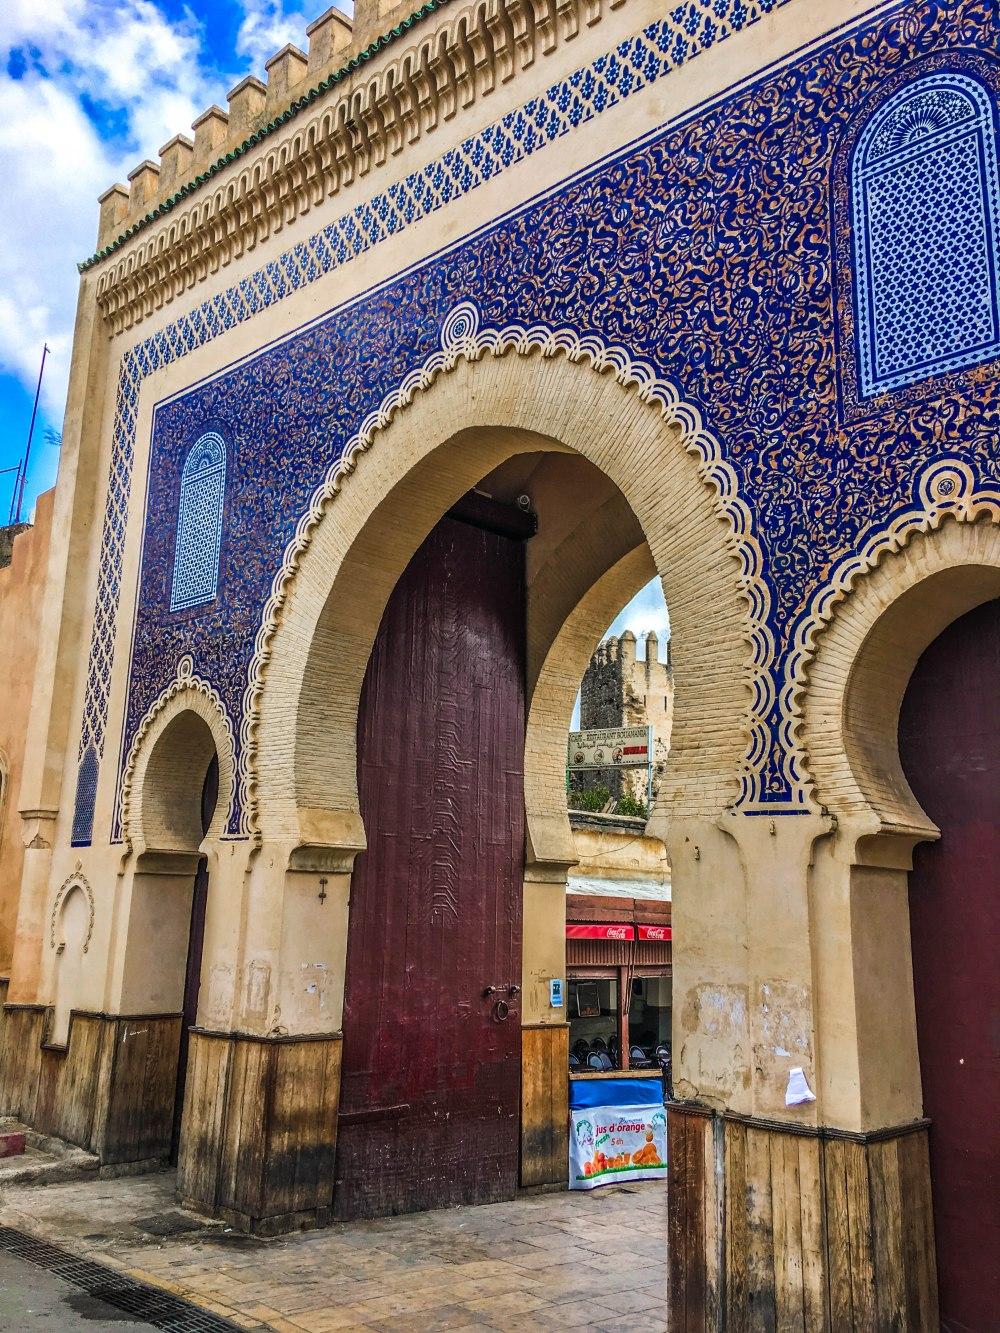 Fes-Meknes-1402